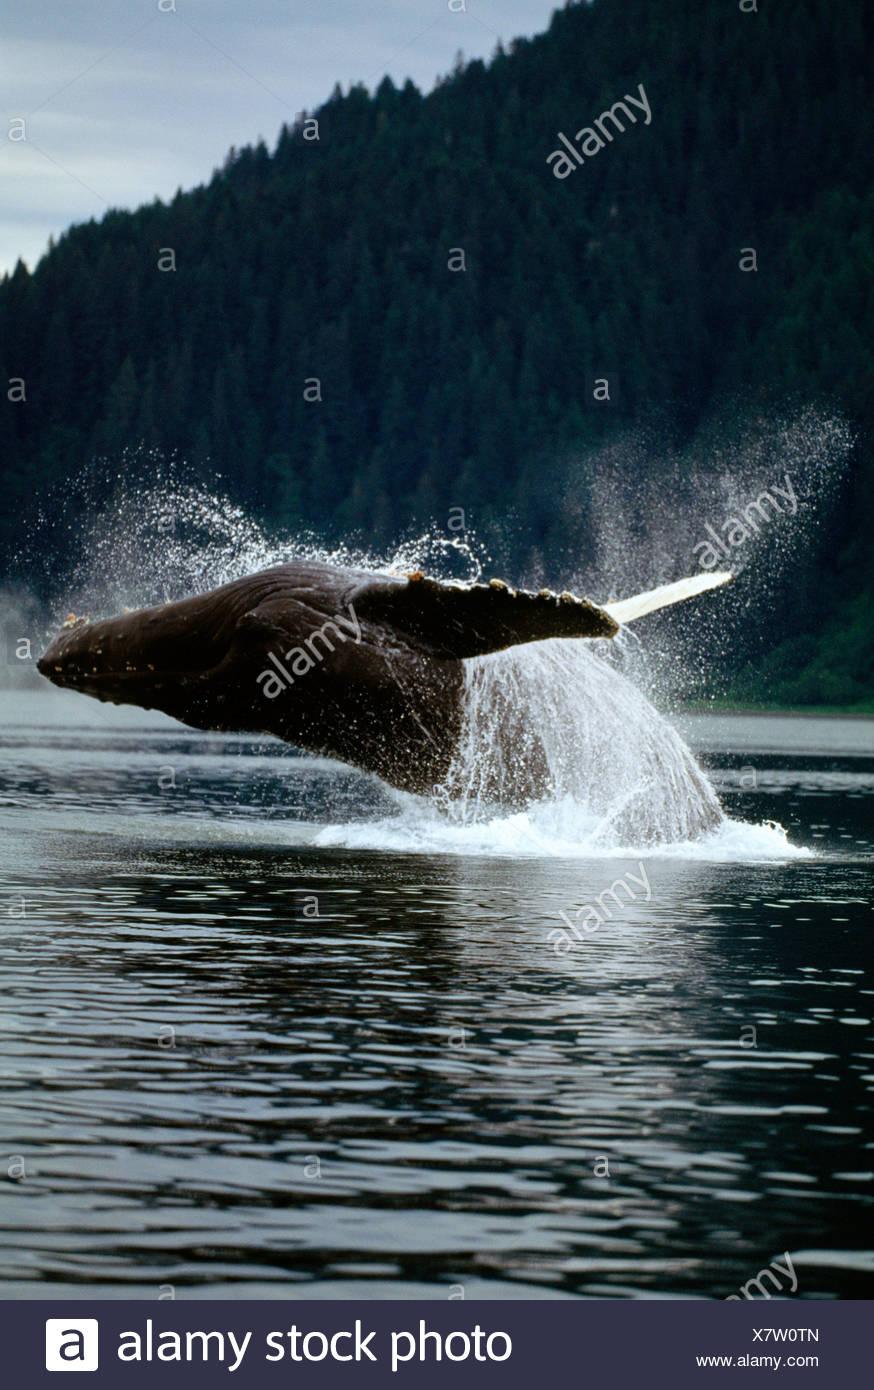 La ballena jorobada, Pt. Adolphus, sureste de Alaska Imagen De Stock